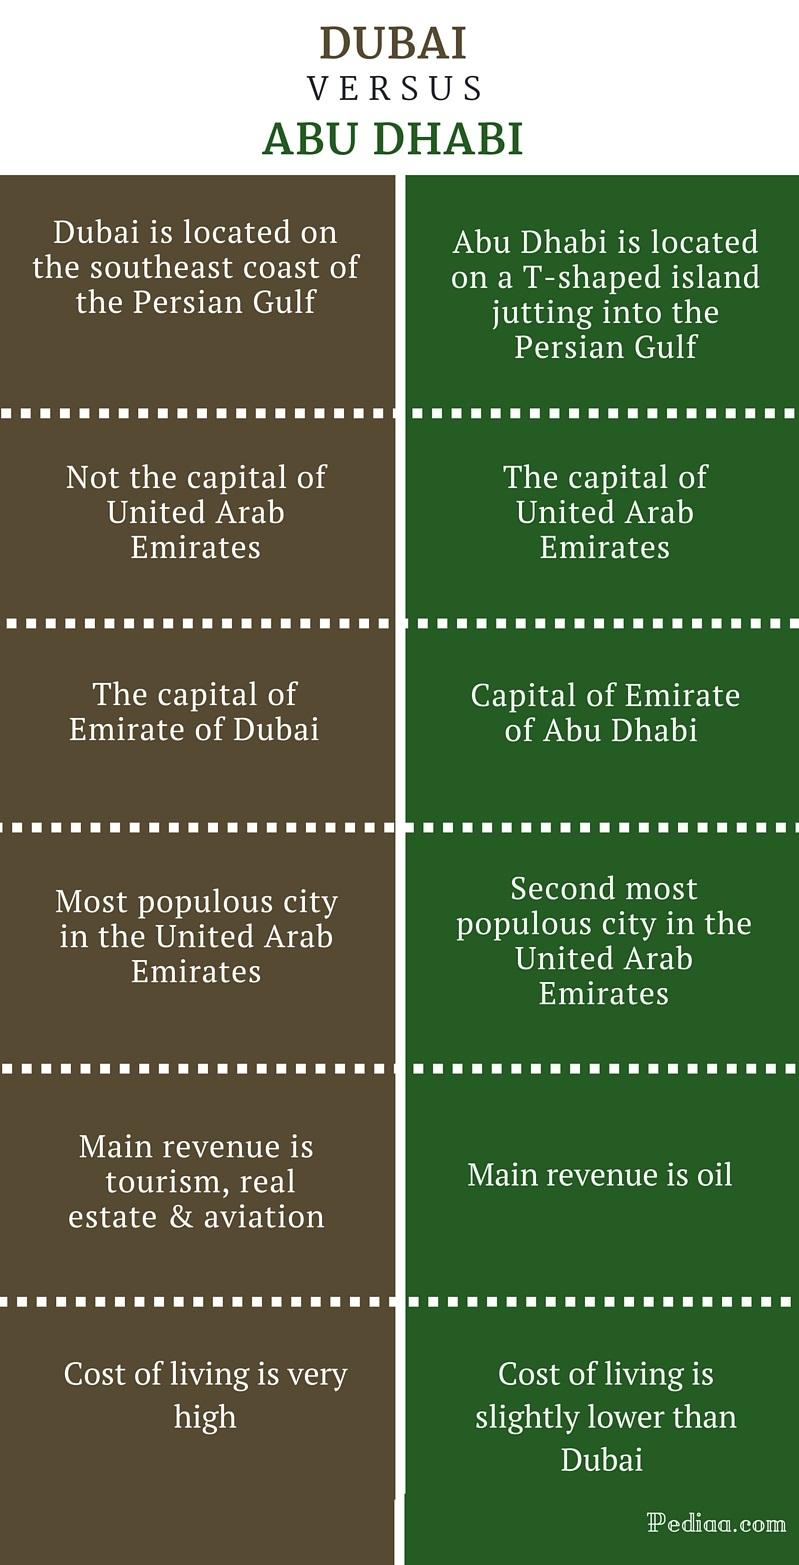 Difference Between Dubai and Abu Dhabi | Location, Capital ...